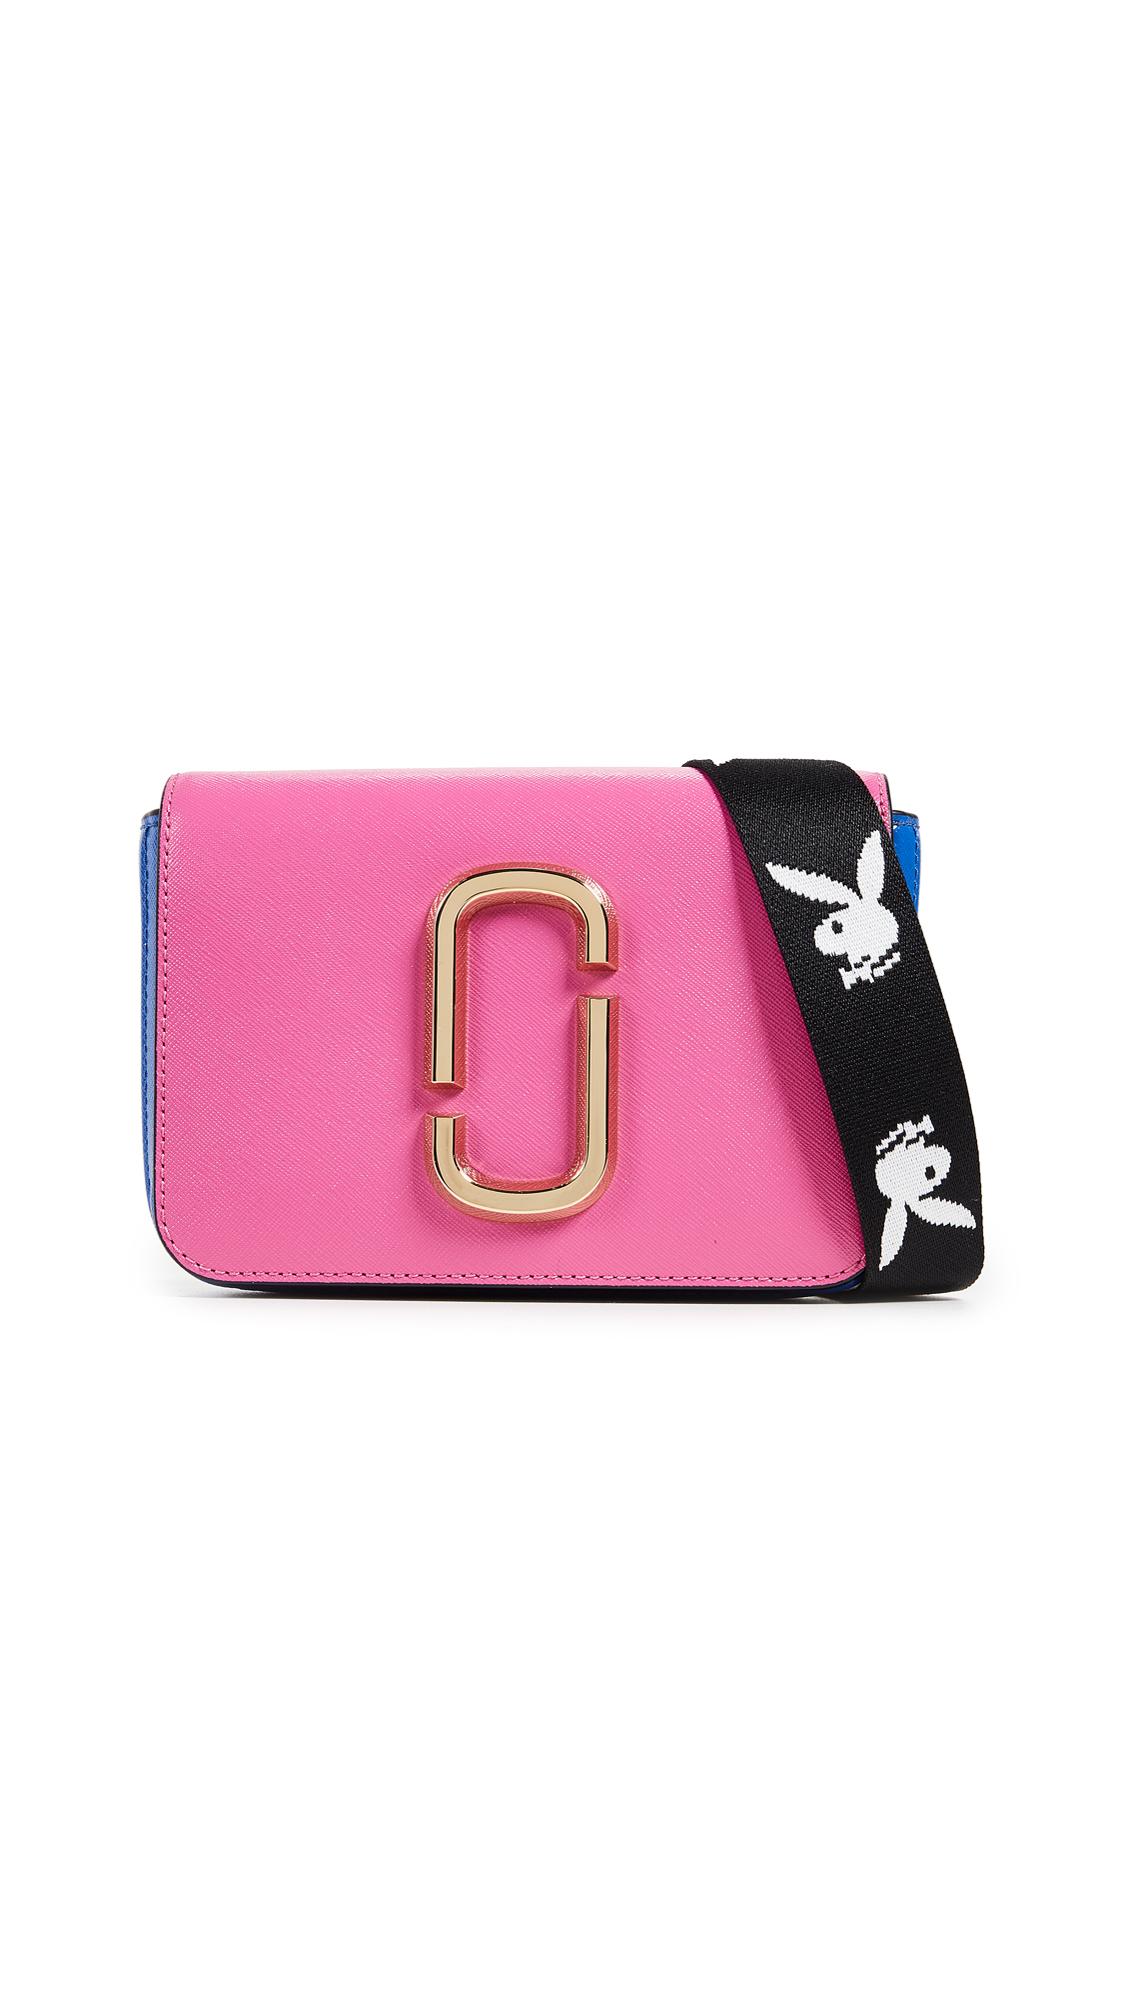 Marc Jacobs Hip Shot Convertible Belt Bag - Vivid Pink